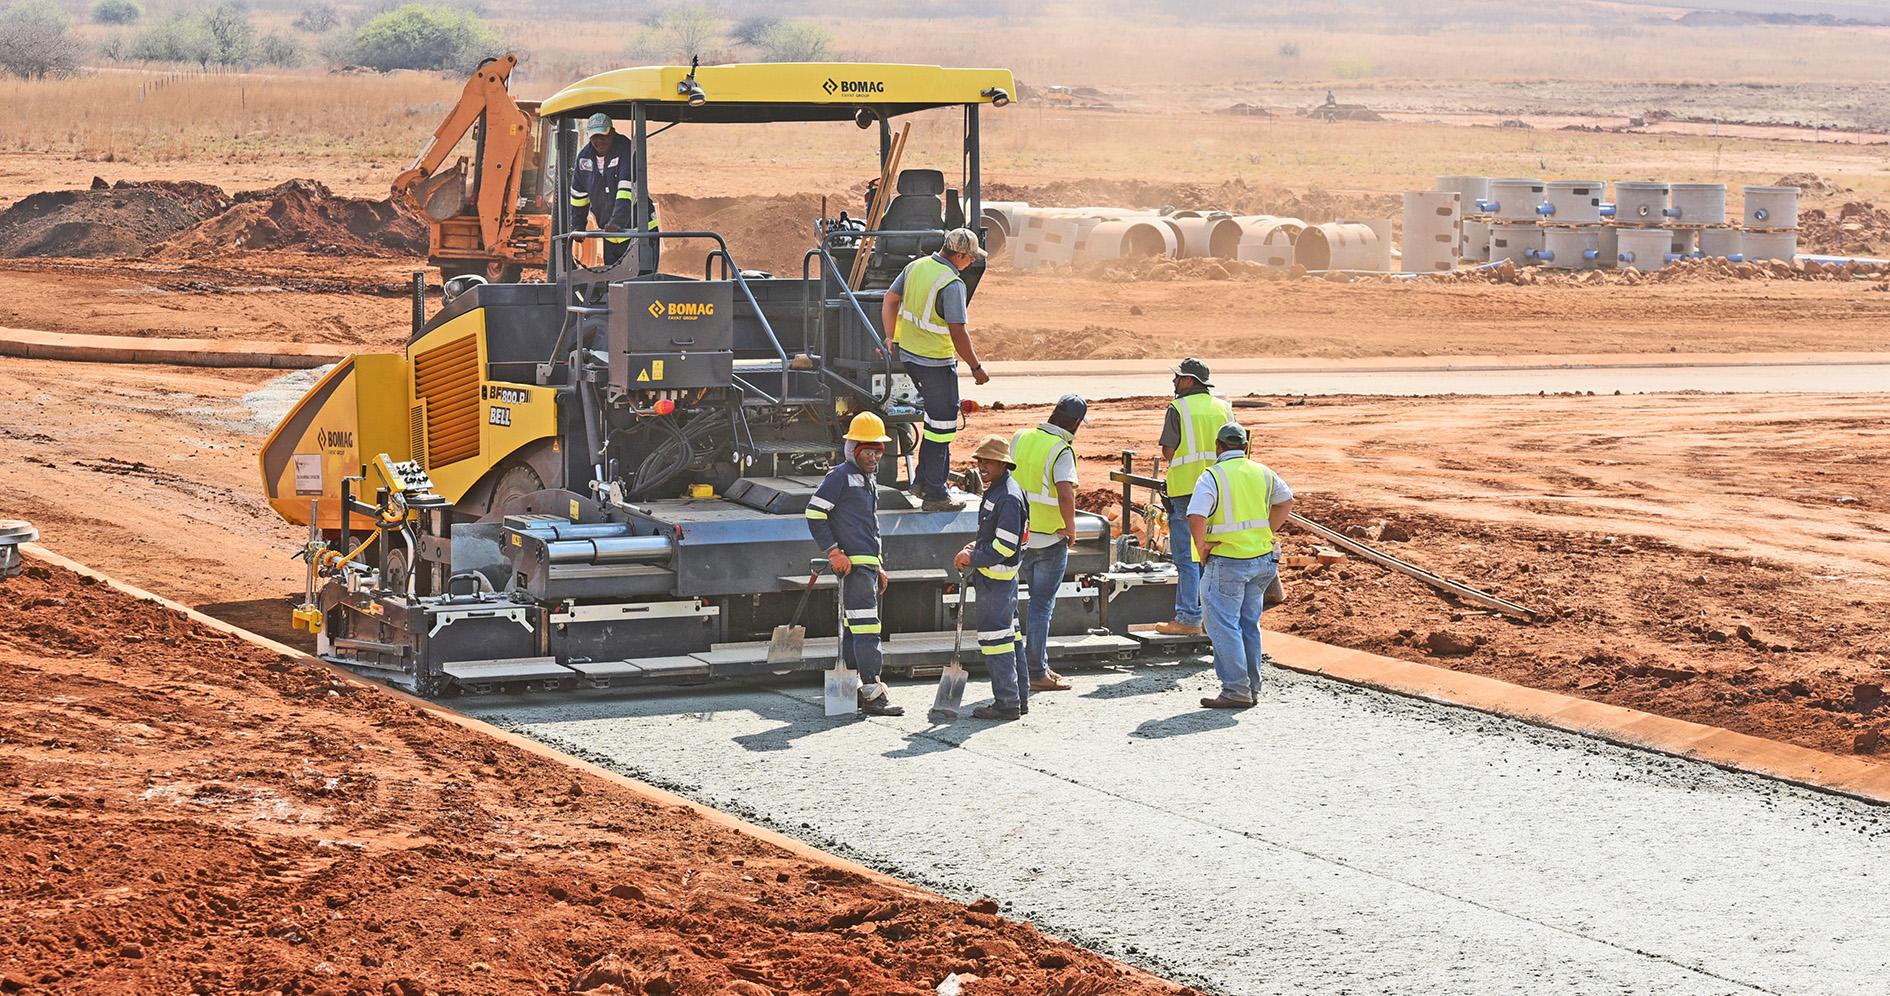 Bomag Maschinen erobern Südafrika